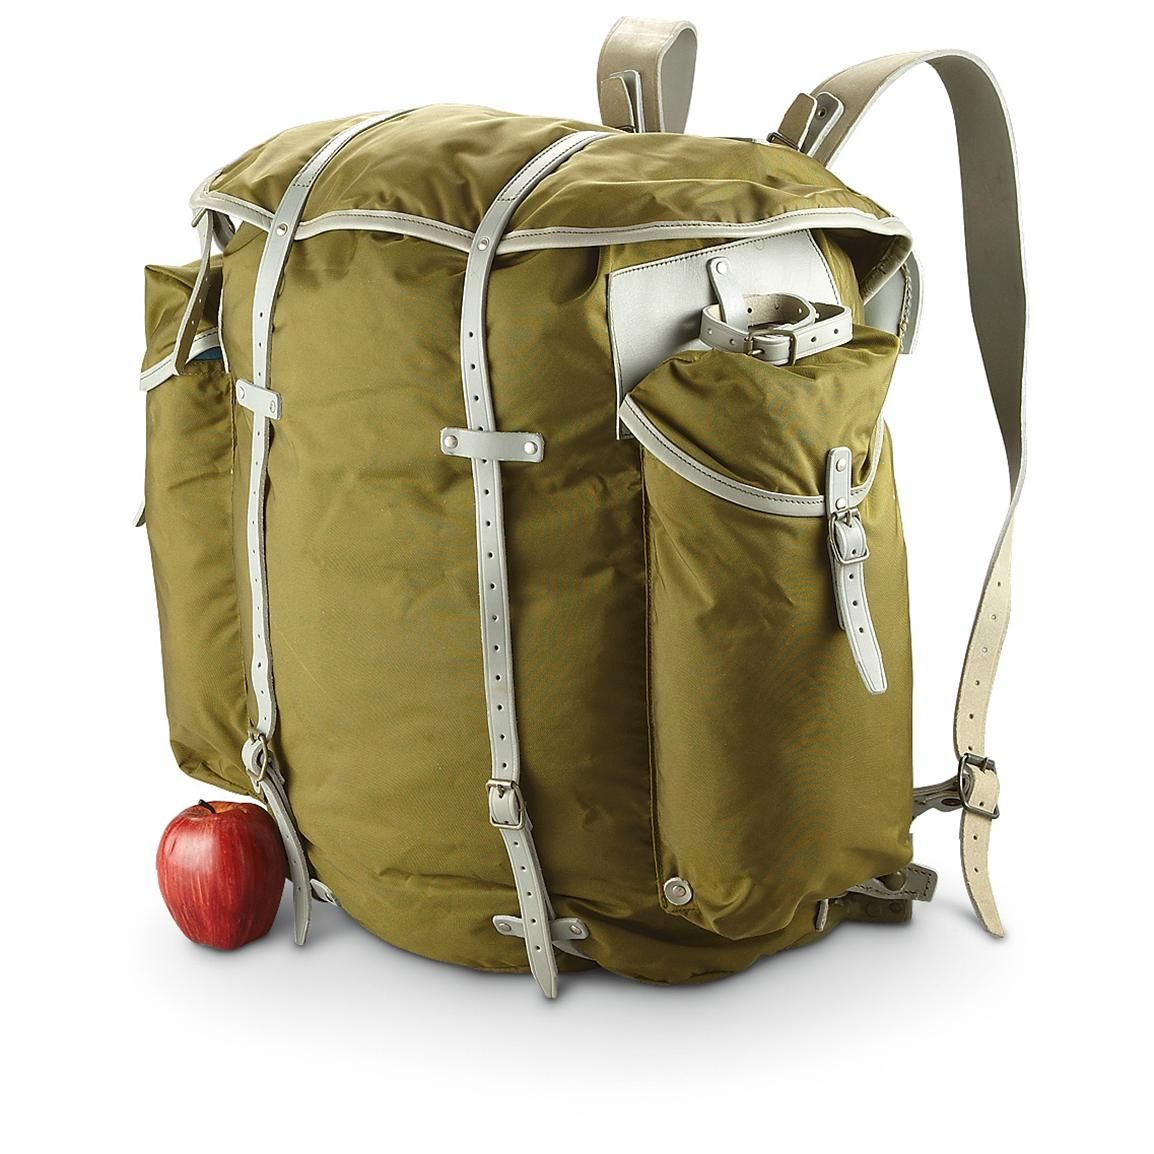 Canvas backpack Backpack of 50s Hunting backpack Vintage backpack Backpack for hiking Backpack Mountain backpack Green backpack